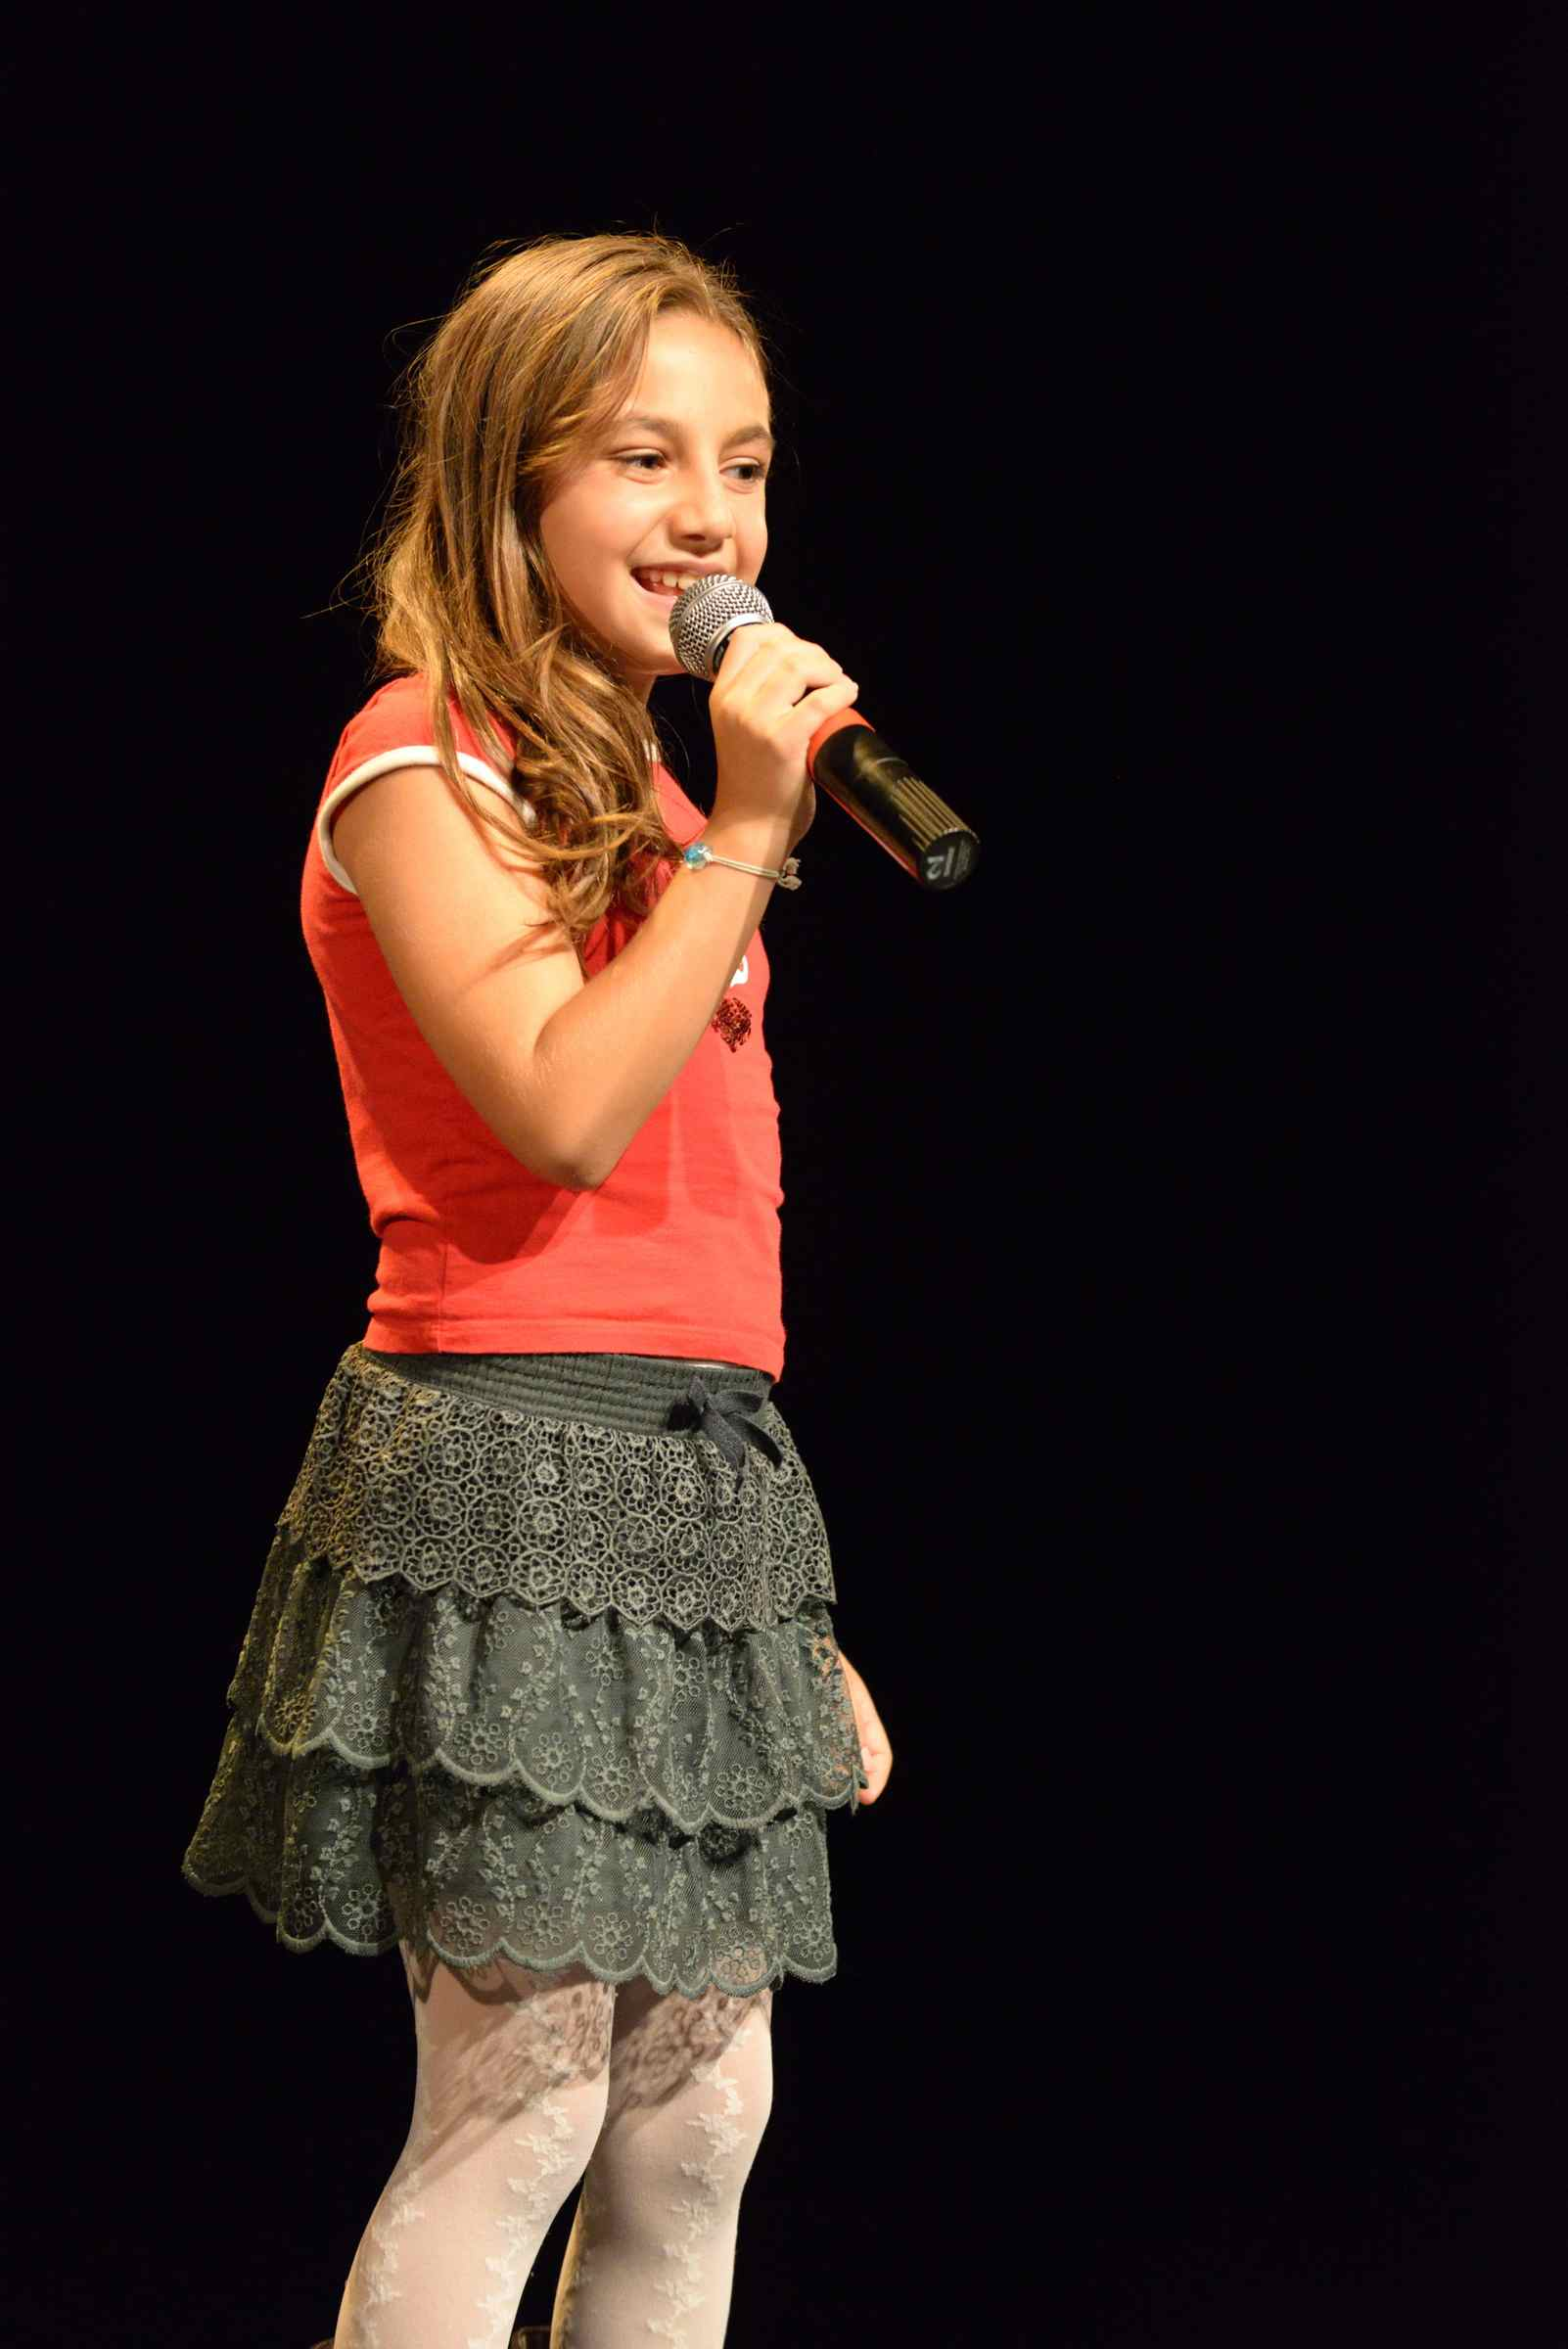 Fabiana Offreda - cantante